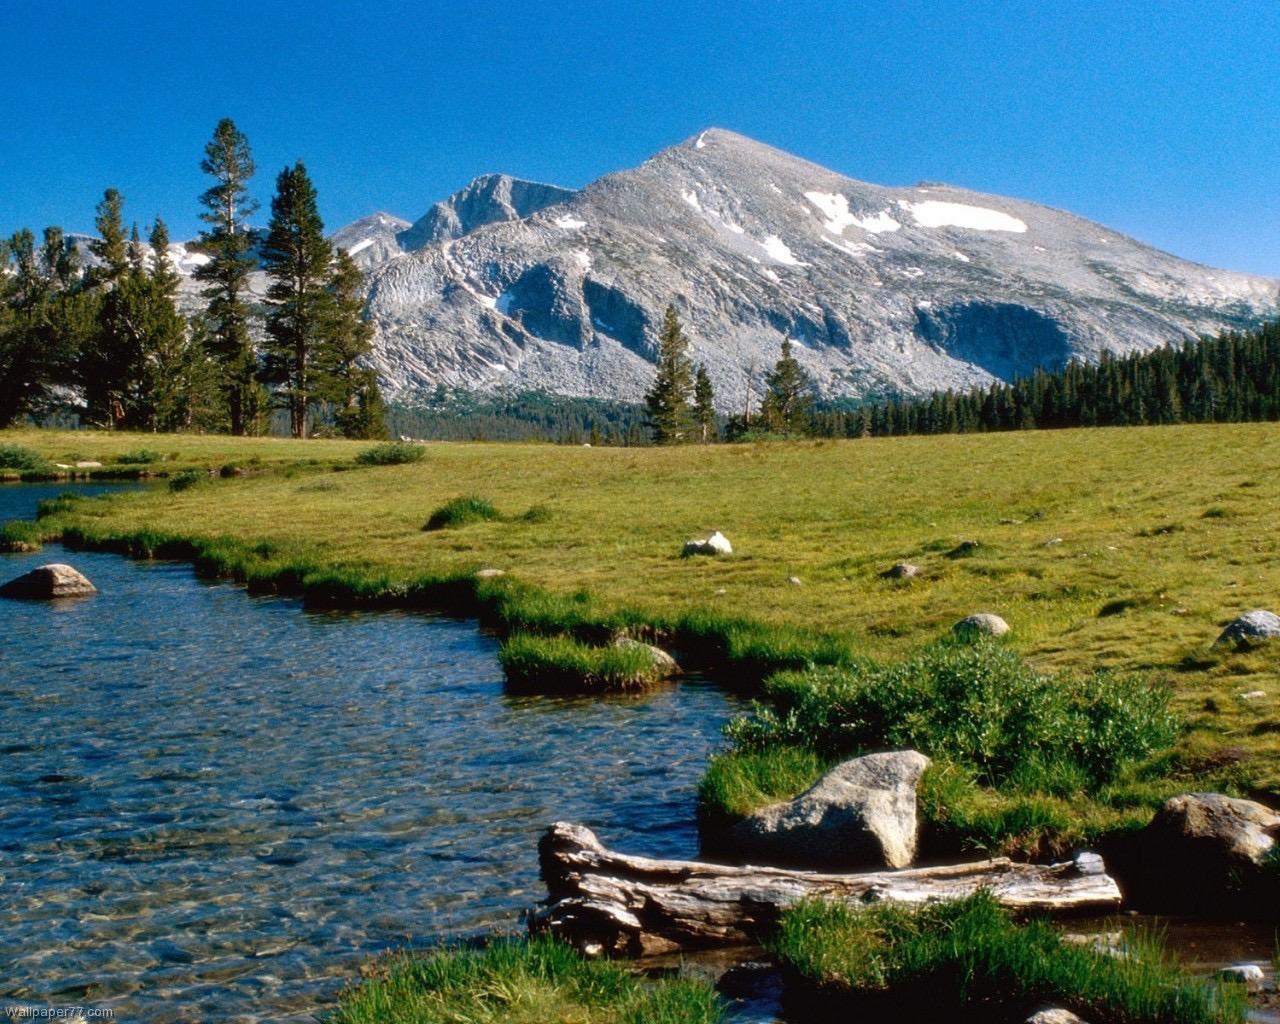 Mammoth-Peak-lake-landscape-mountain-1280x1024.jpg